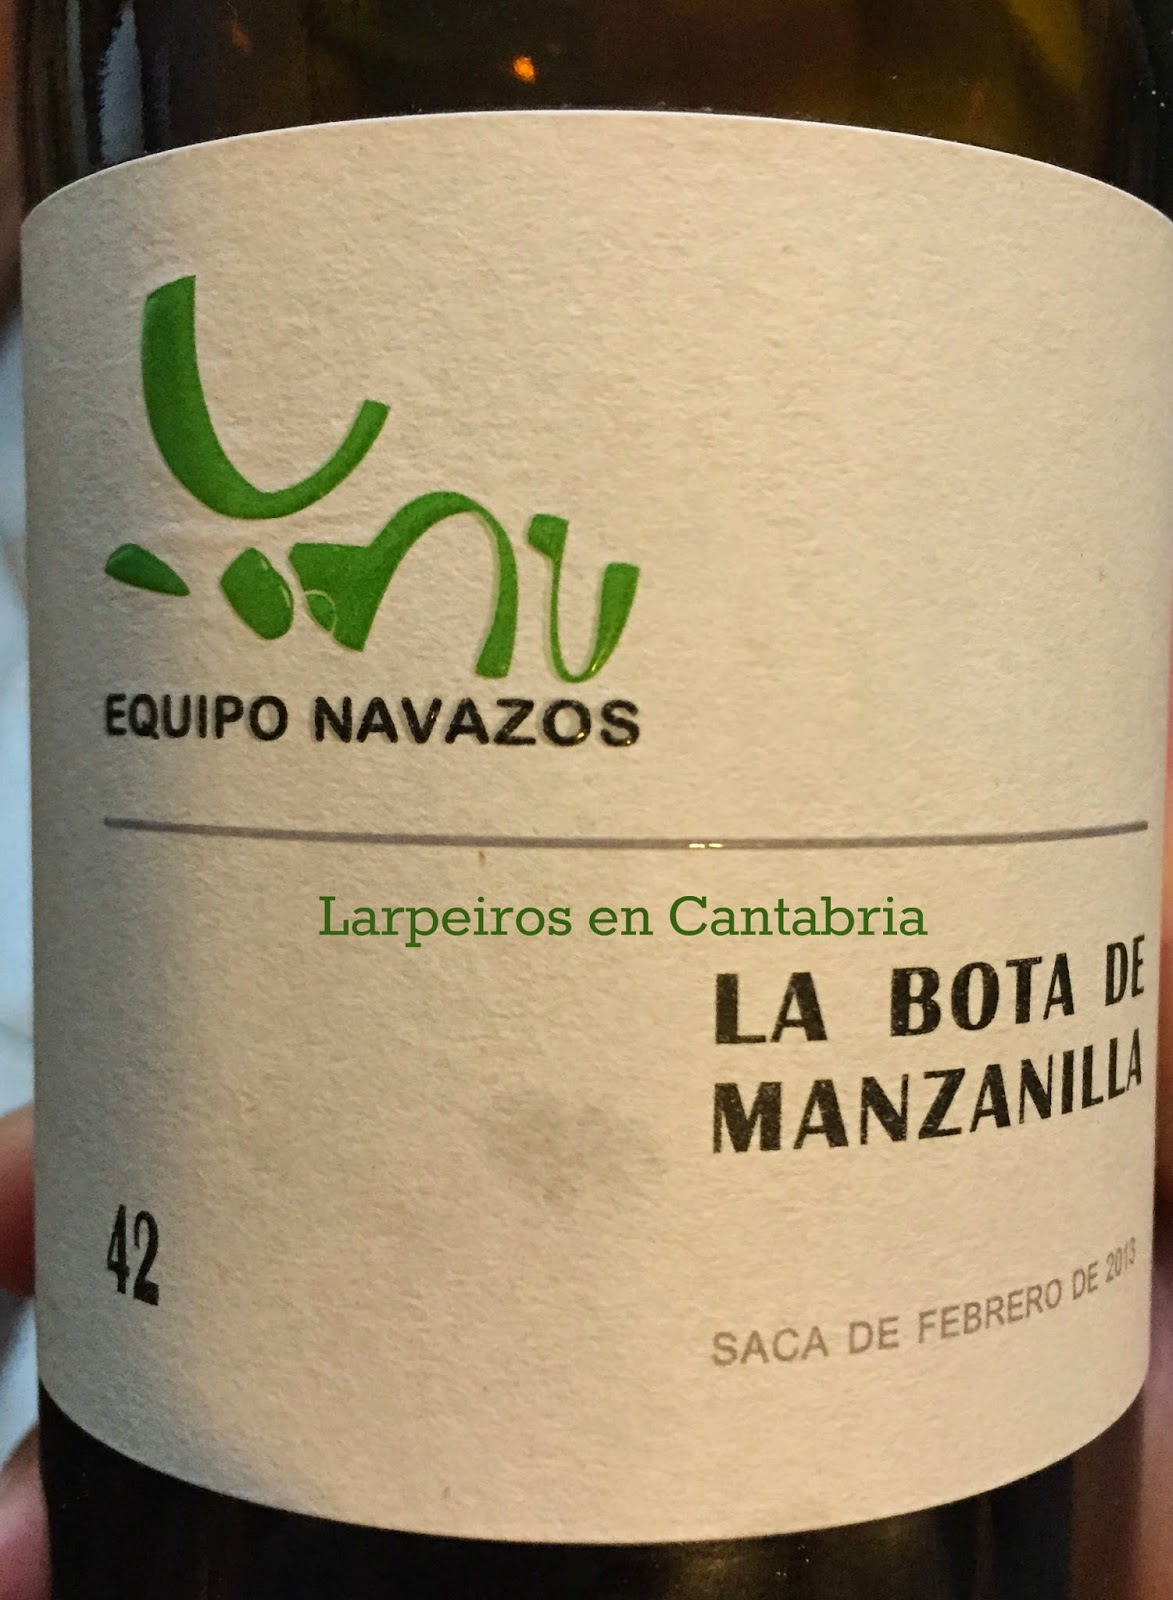 La Bota de Manzanilla Nº 42: Nos apasiona